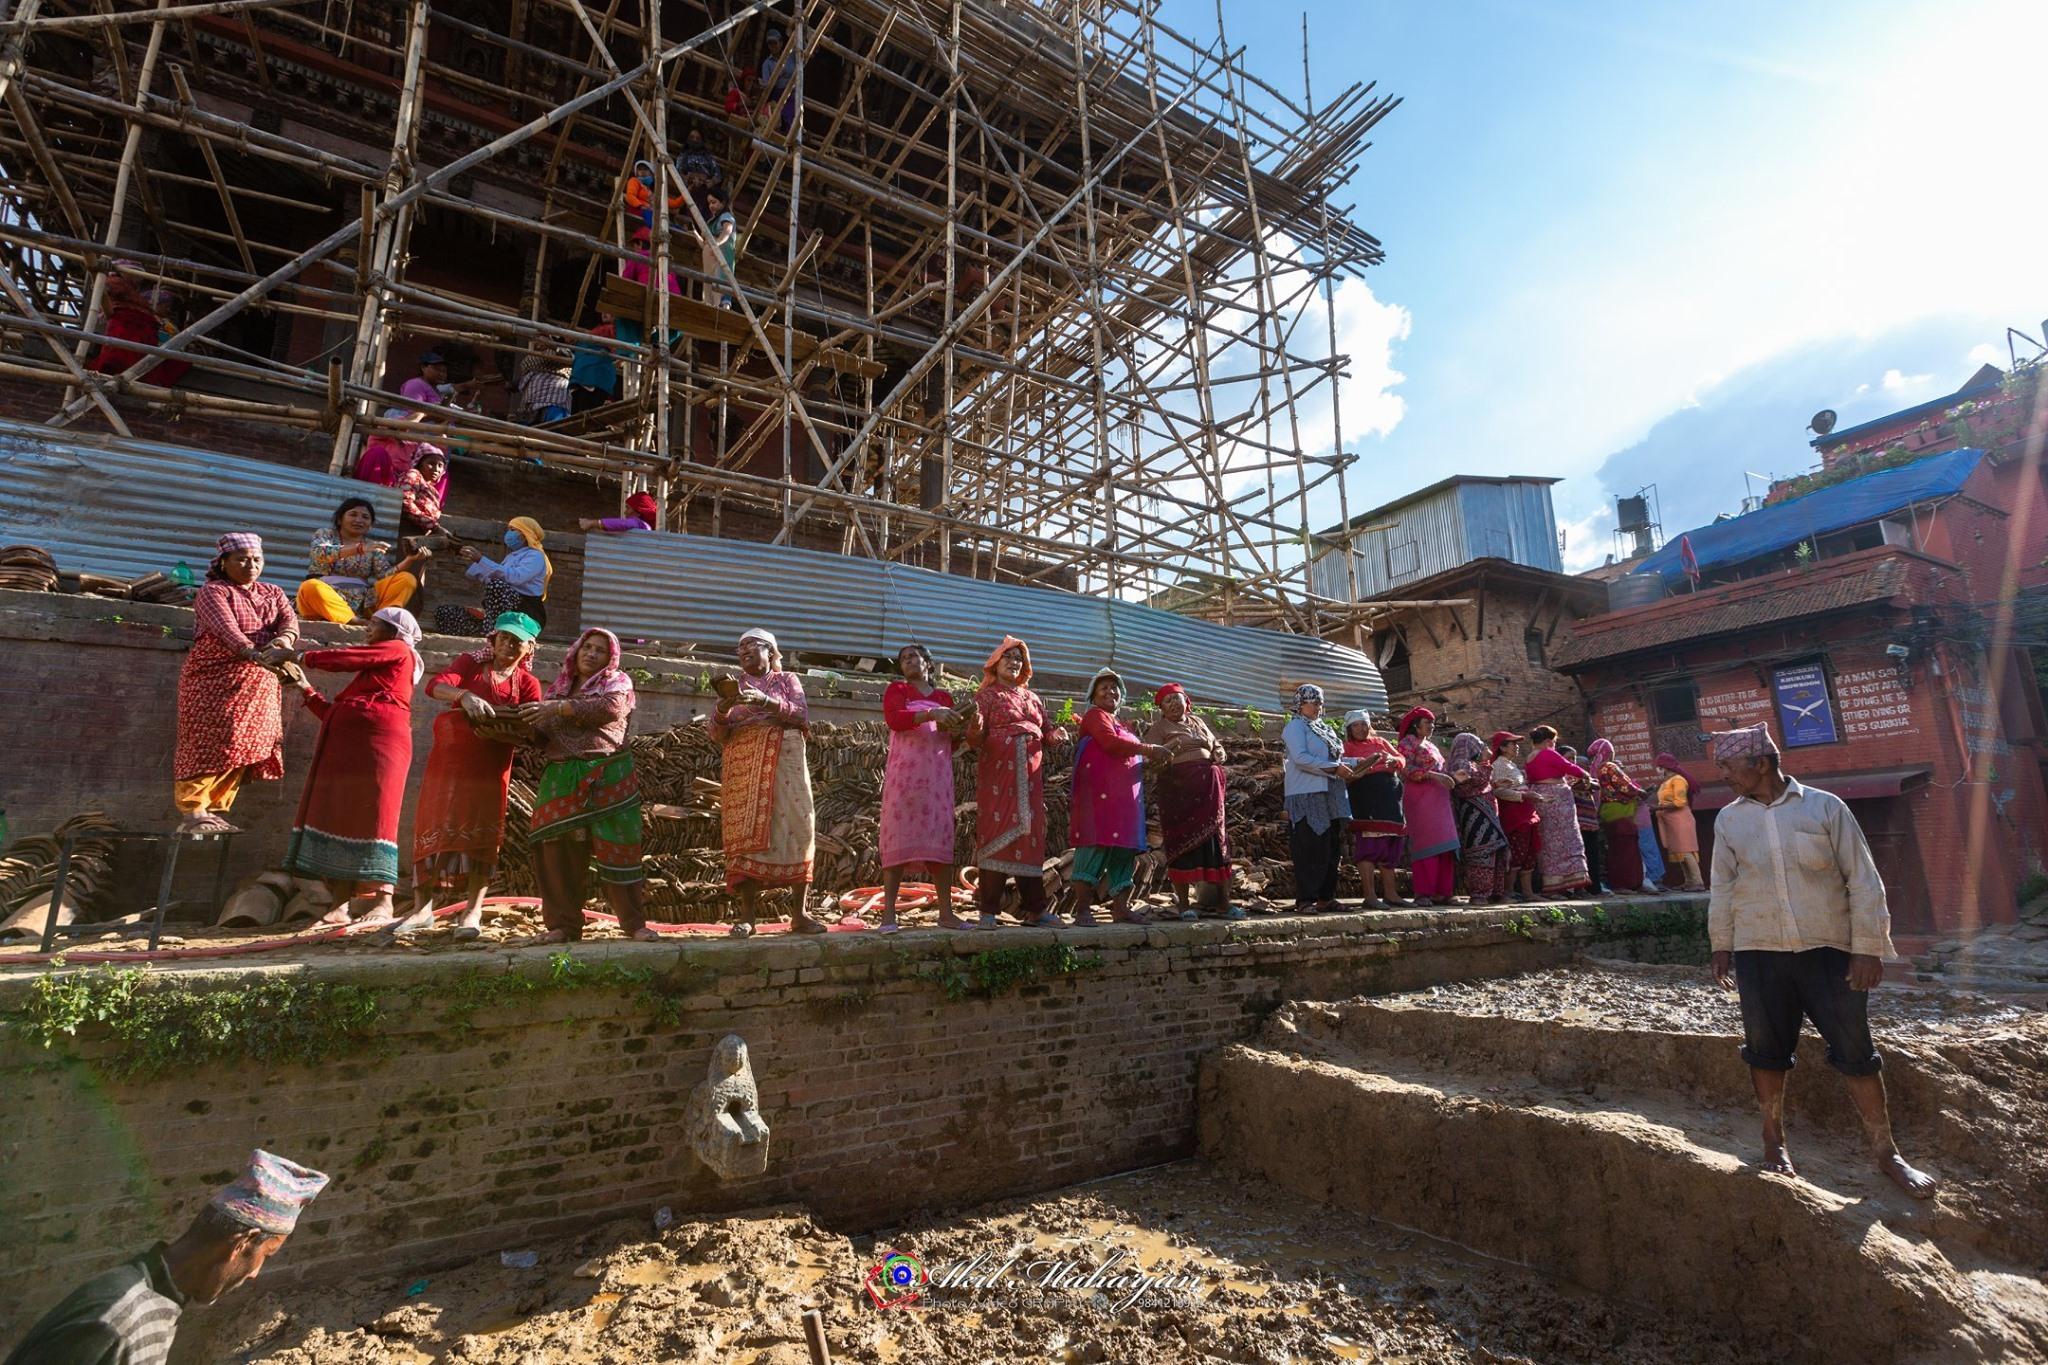 https://www.bhaktapur.com/wp-content/uploads/2020/06/अकिल-महर्जन.jpg